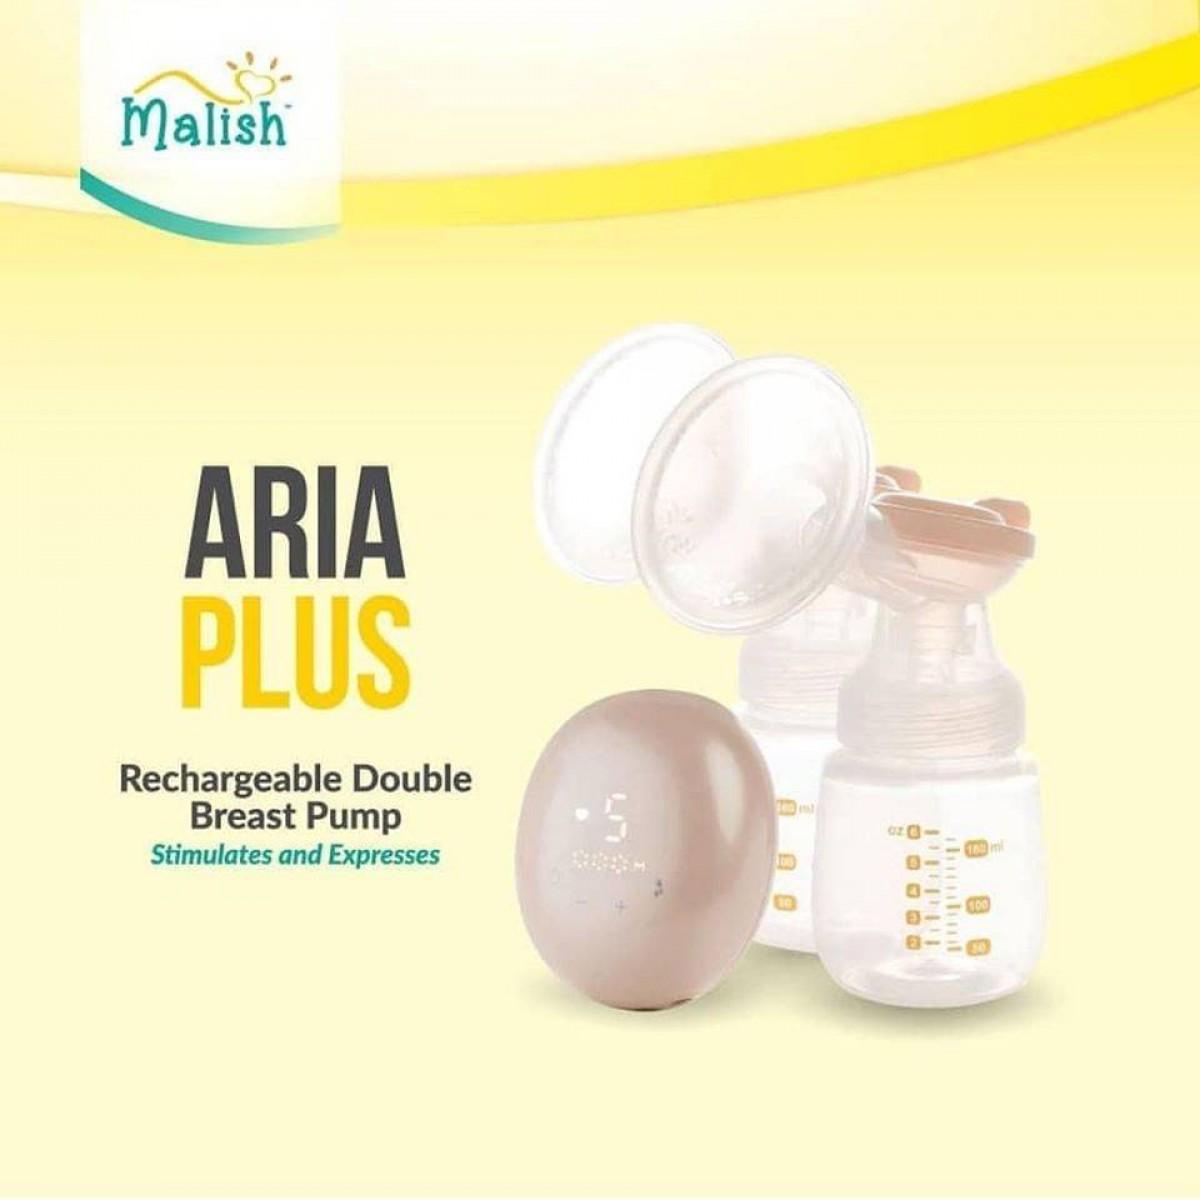 Malish Aria Plus Electic Rechargeble Double Pump - Kico Baby Center